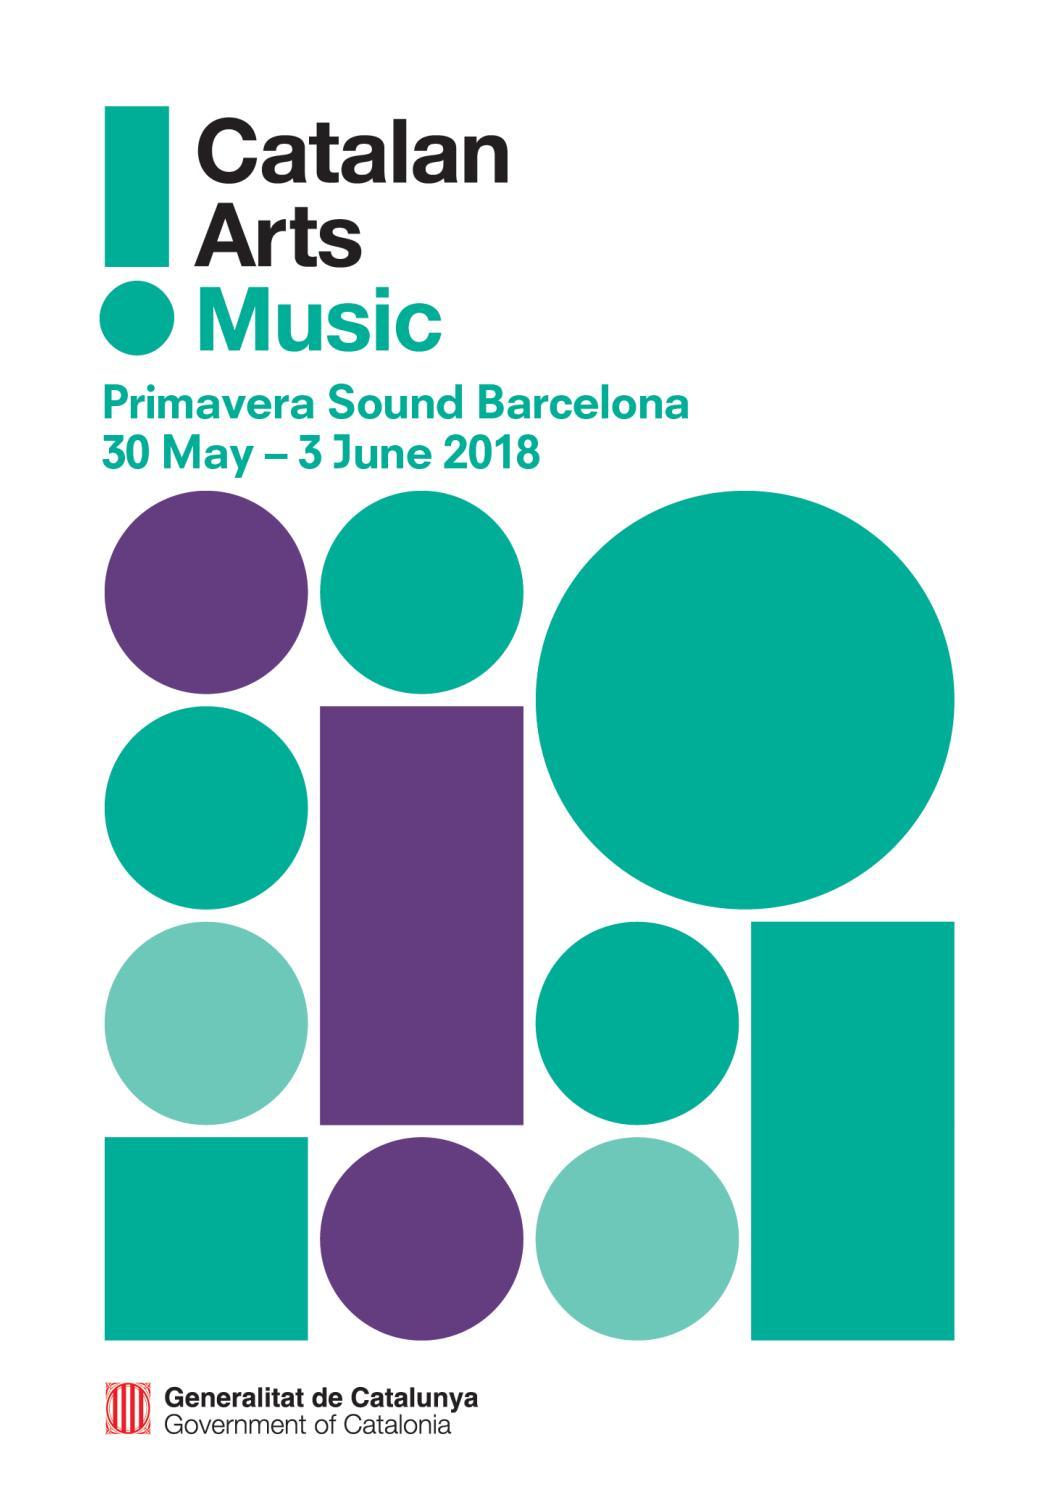 Primavera Sound 2018 by Institut Català de les Empreses